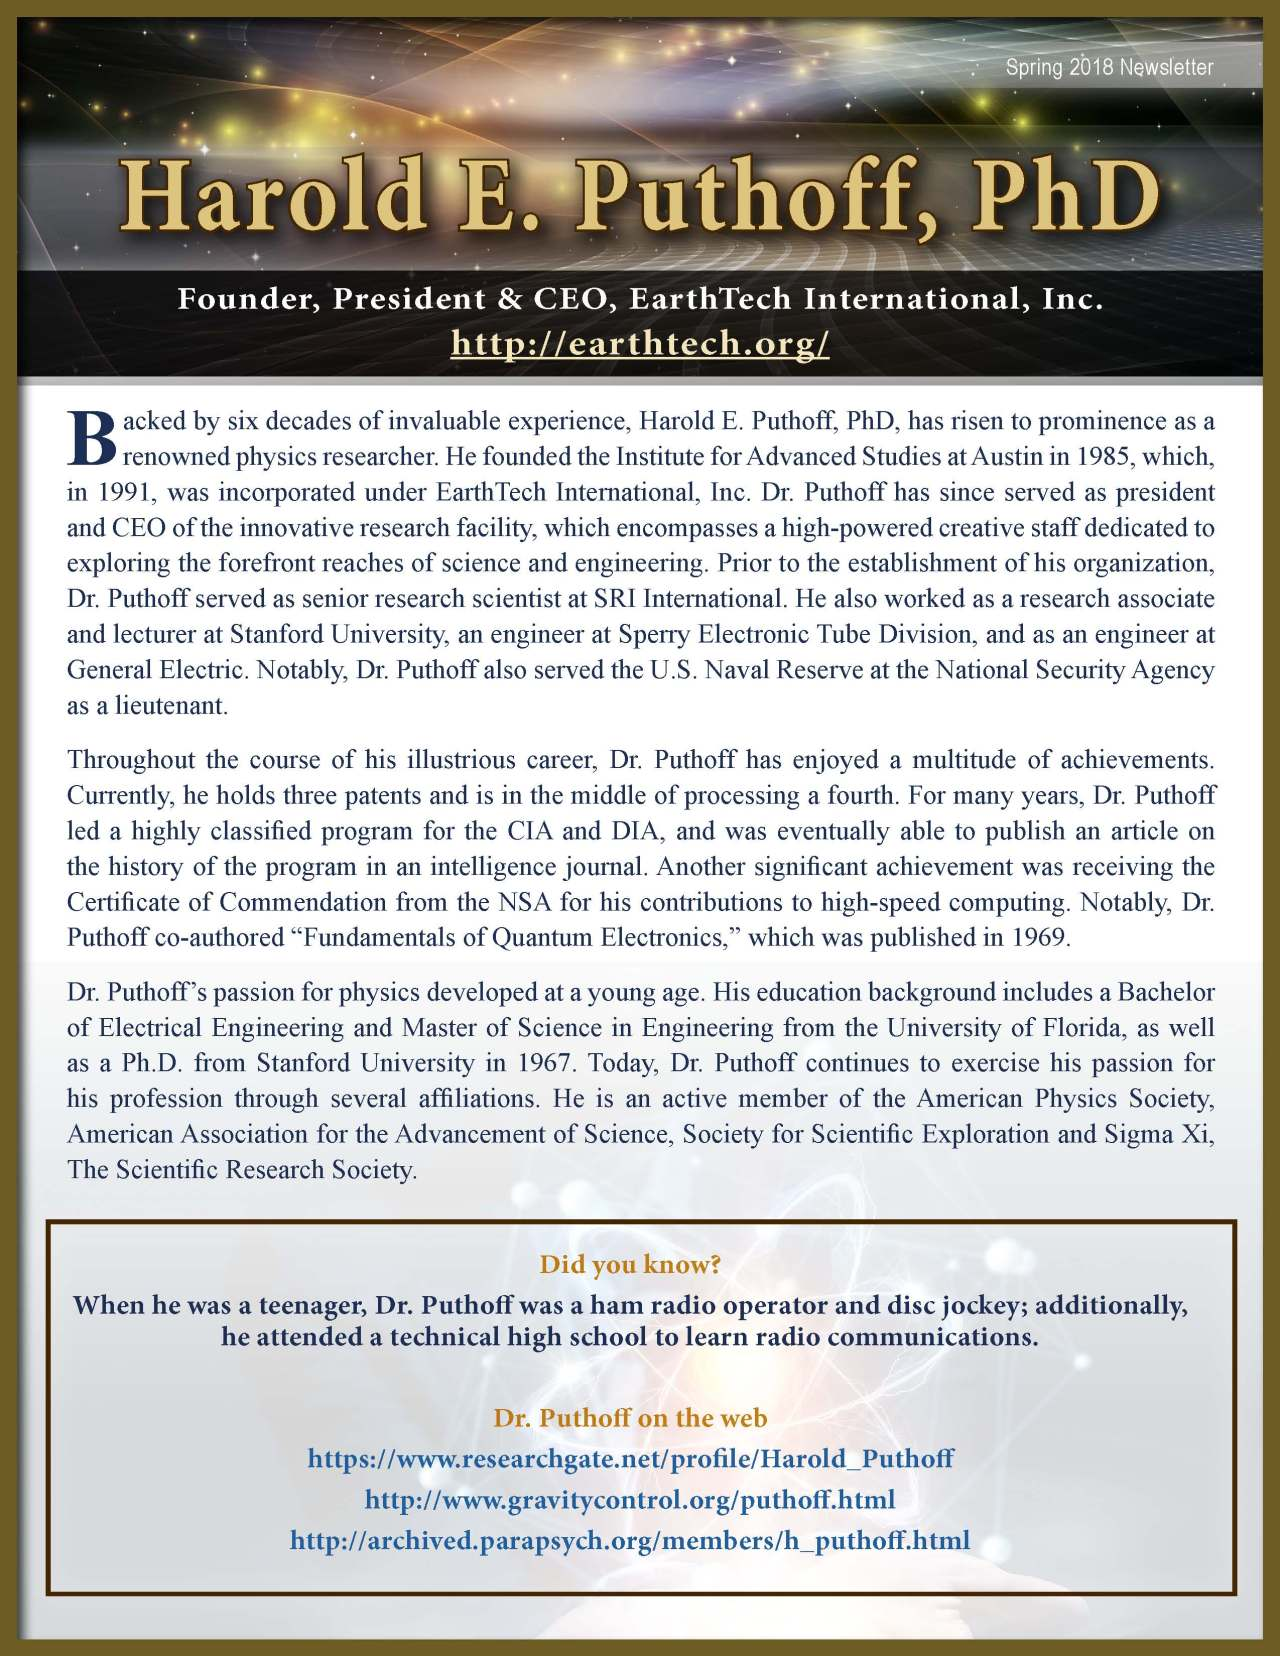 Puthoff, Harold 3688207_4003688207 Newsletter REVISED